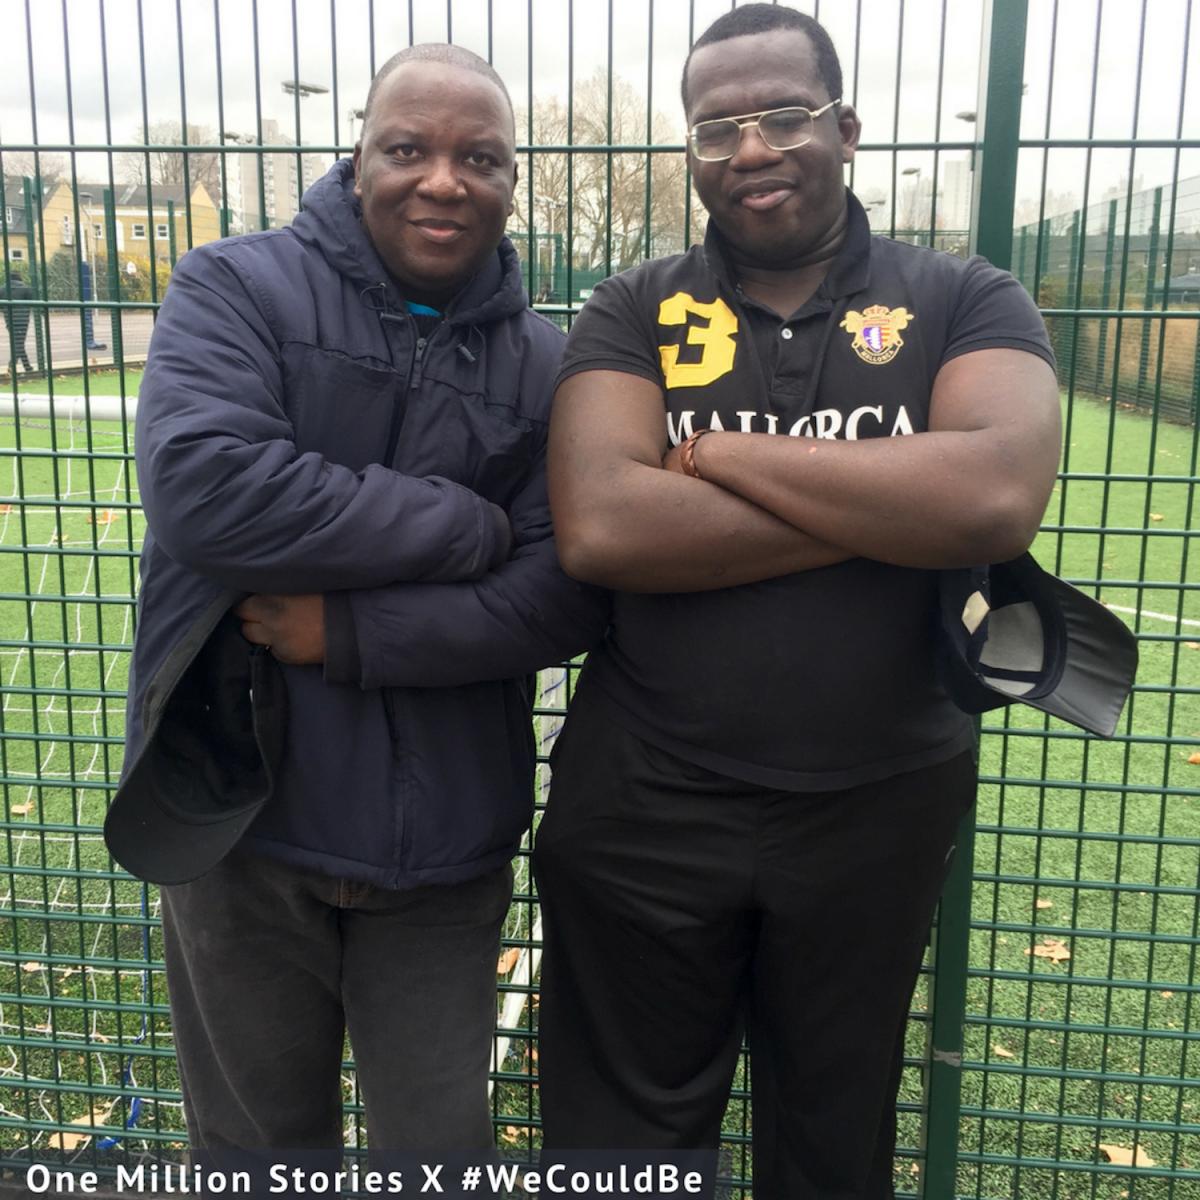 #WeCouldBe X One Million Stories - Peter Mensah Disability Sports Coach & London Sport